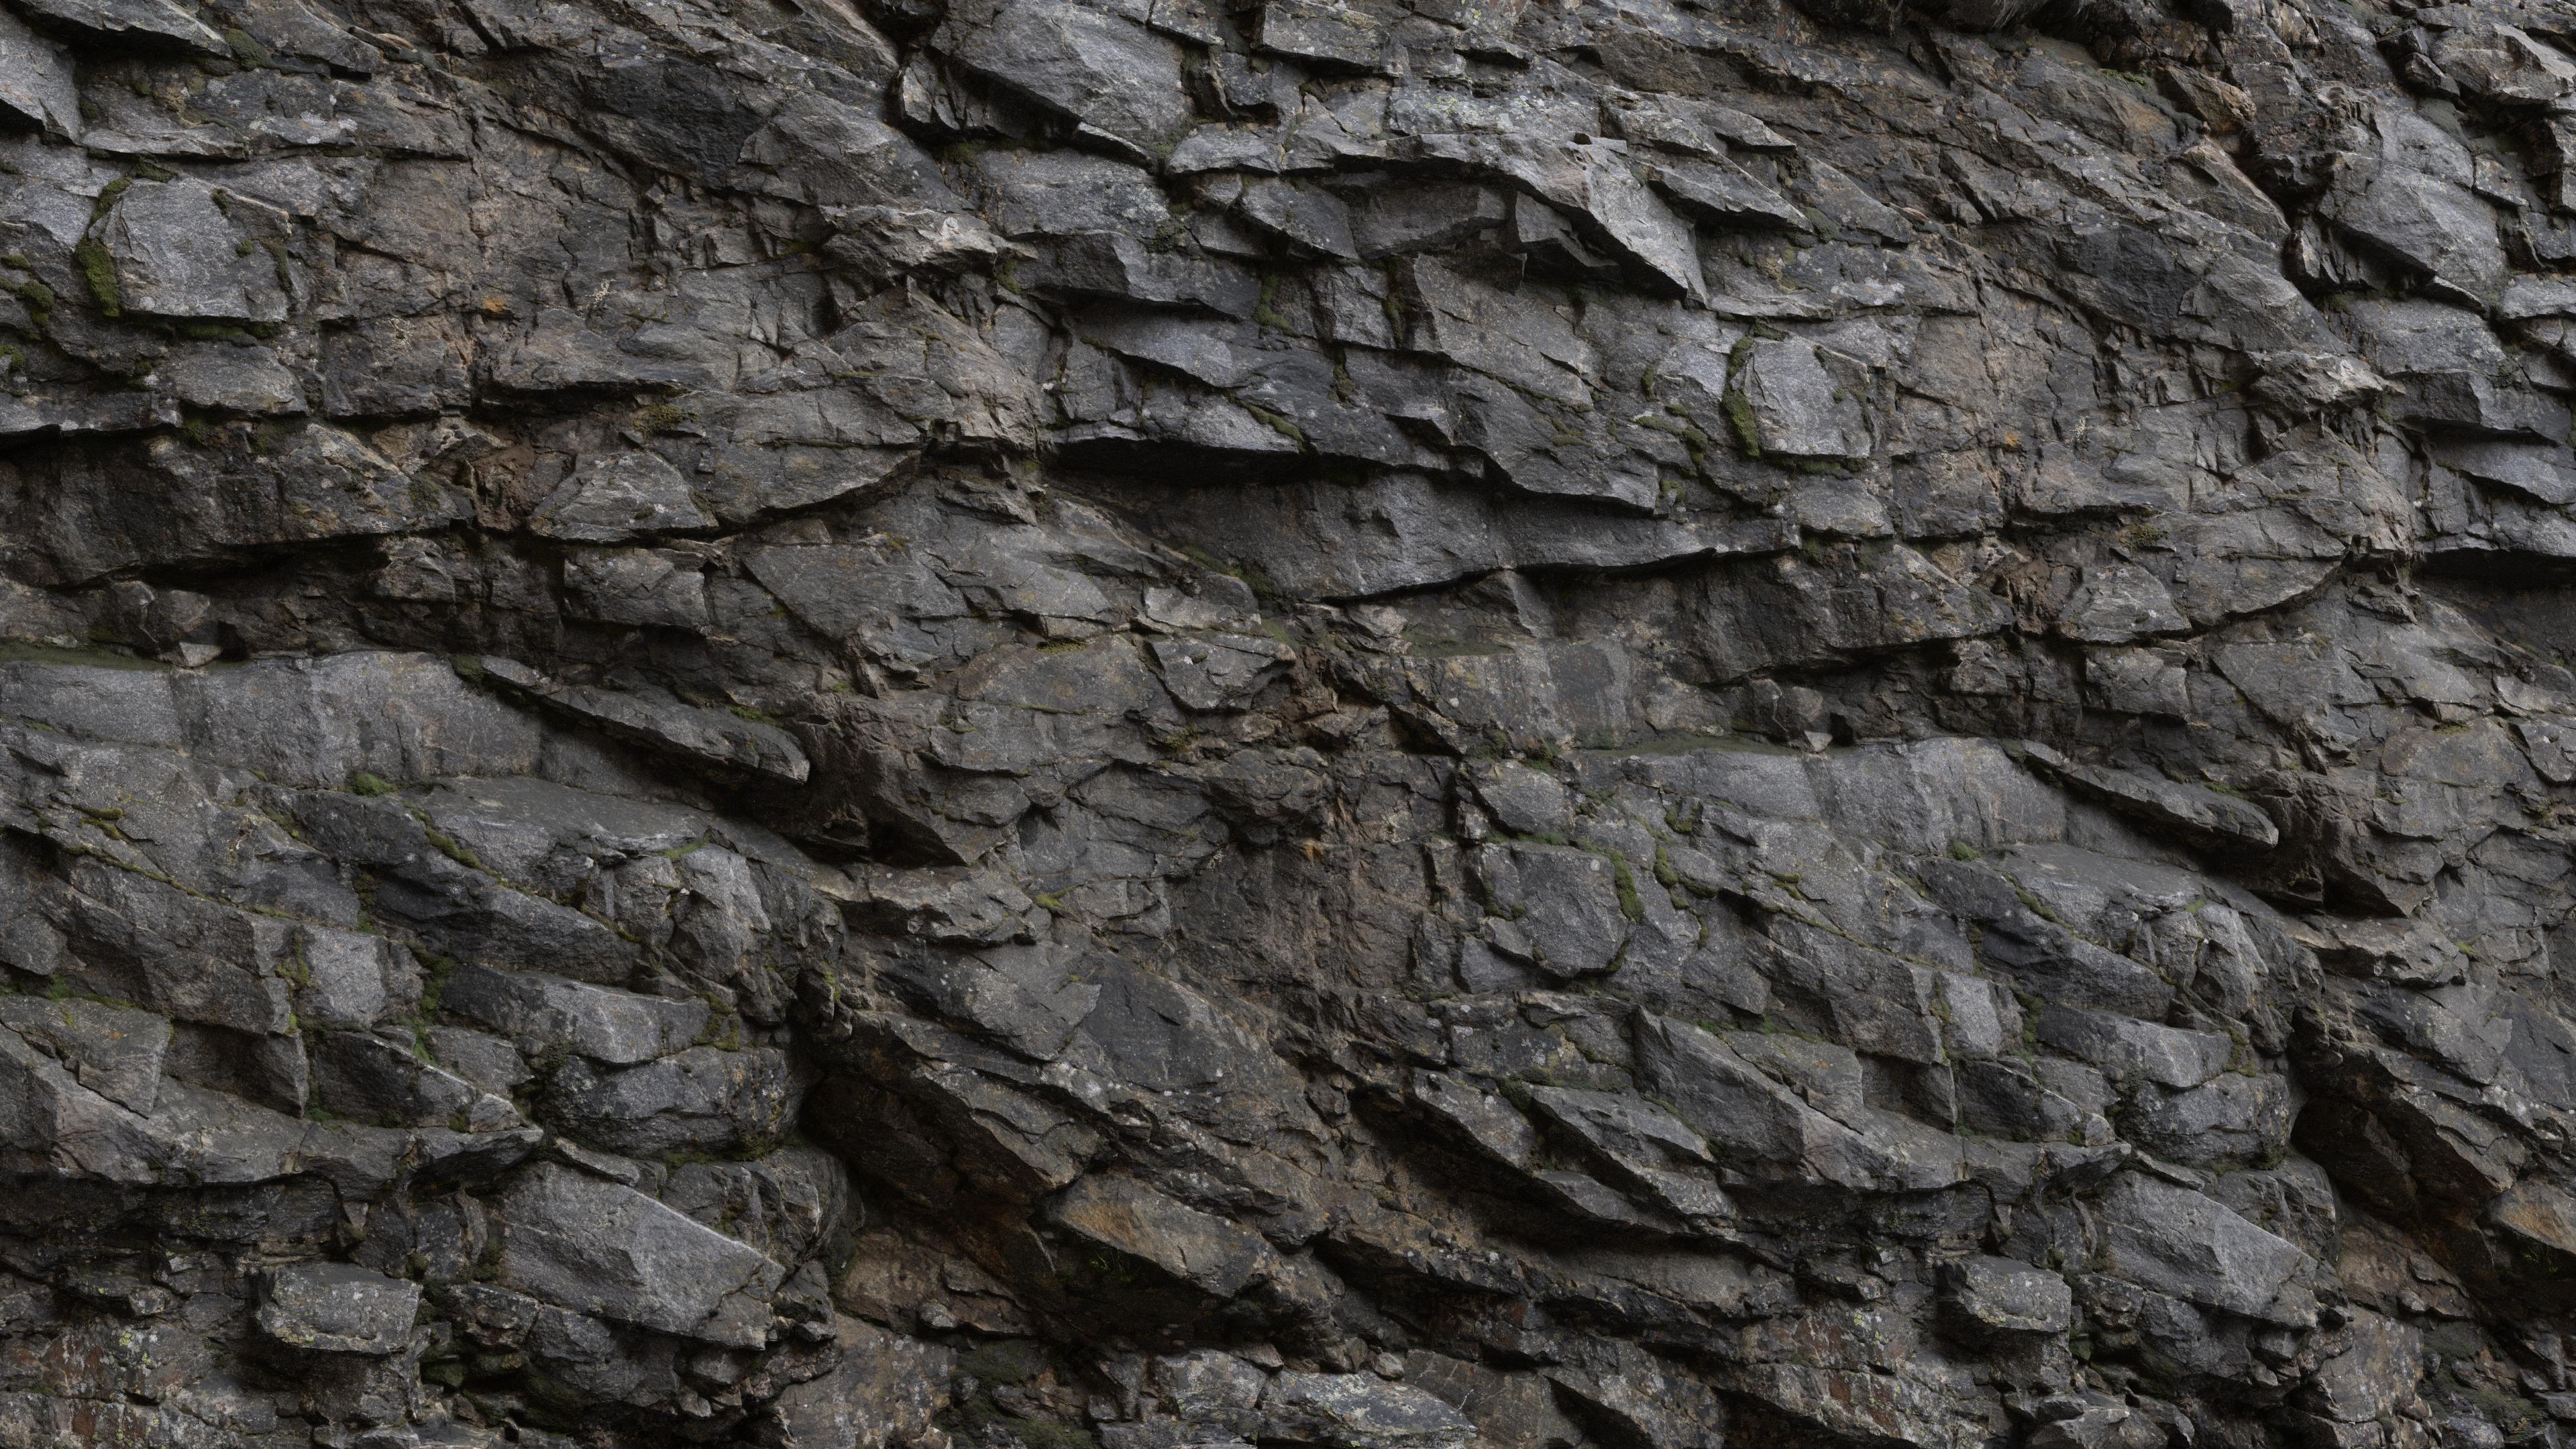 3D Scanned Cliff Rock - 2x2 meters